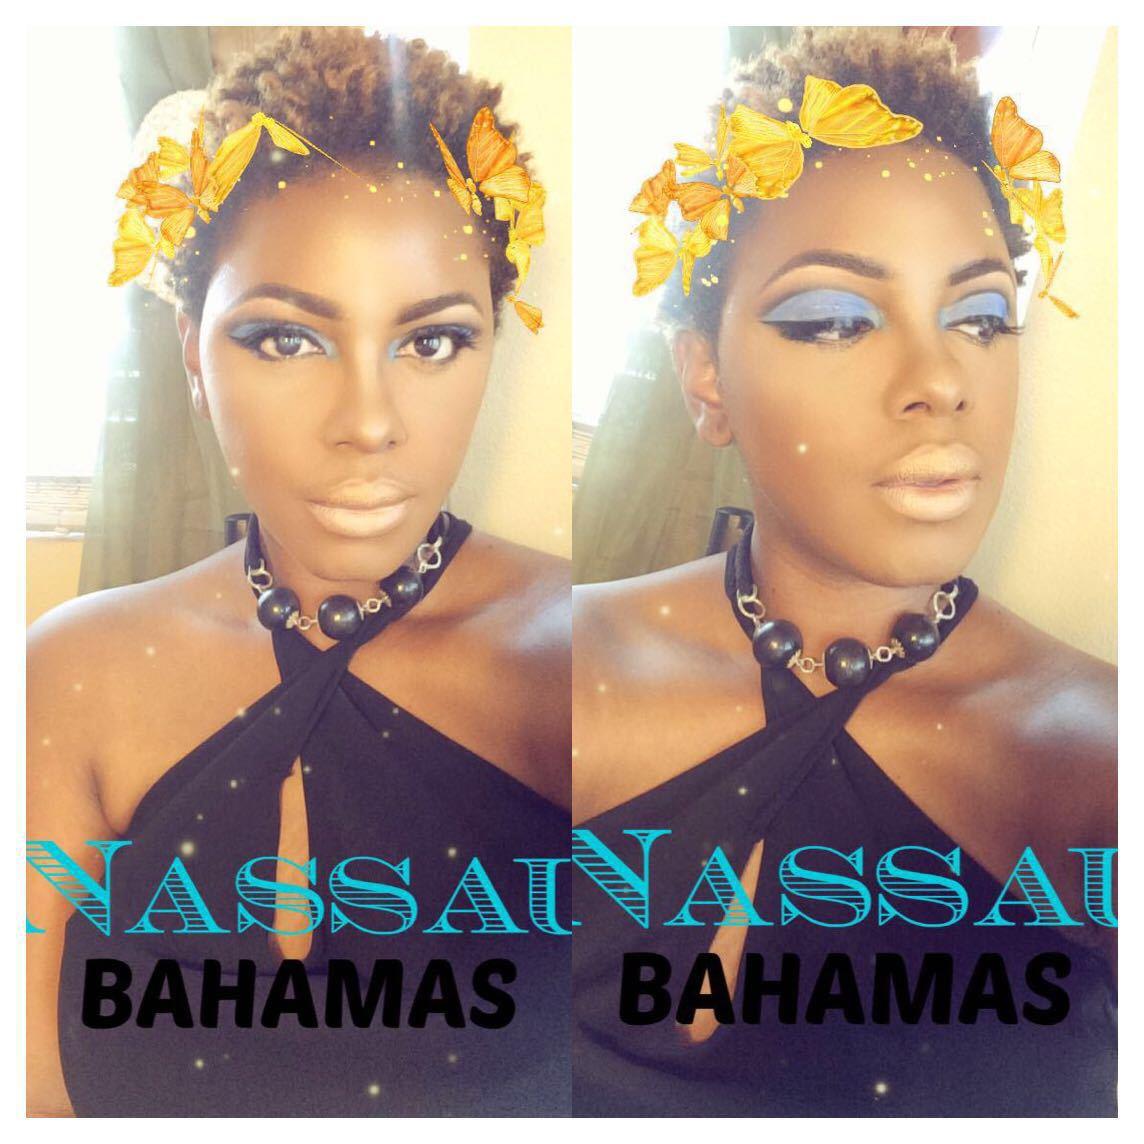 Bahamian Pride